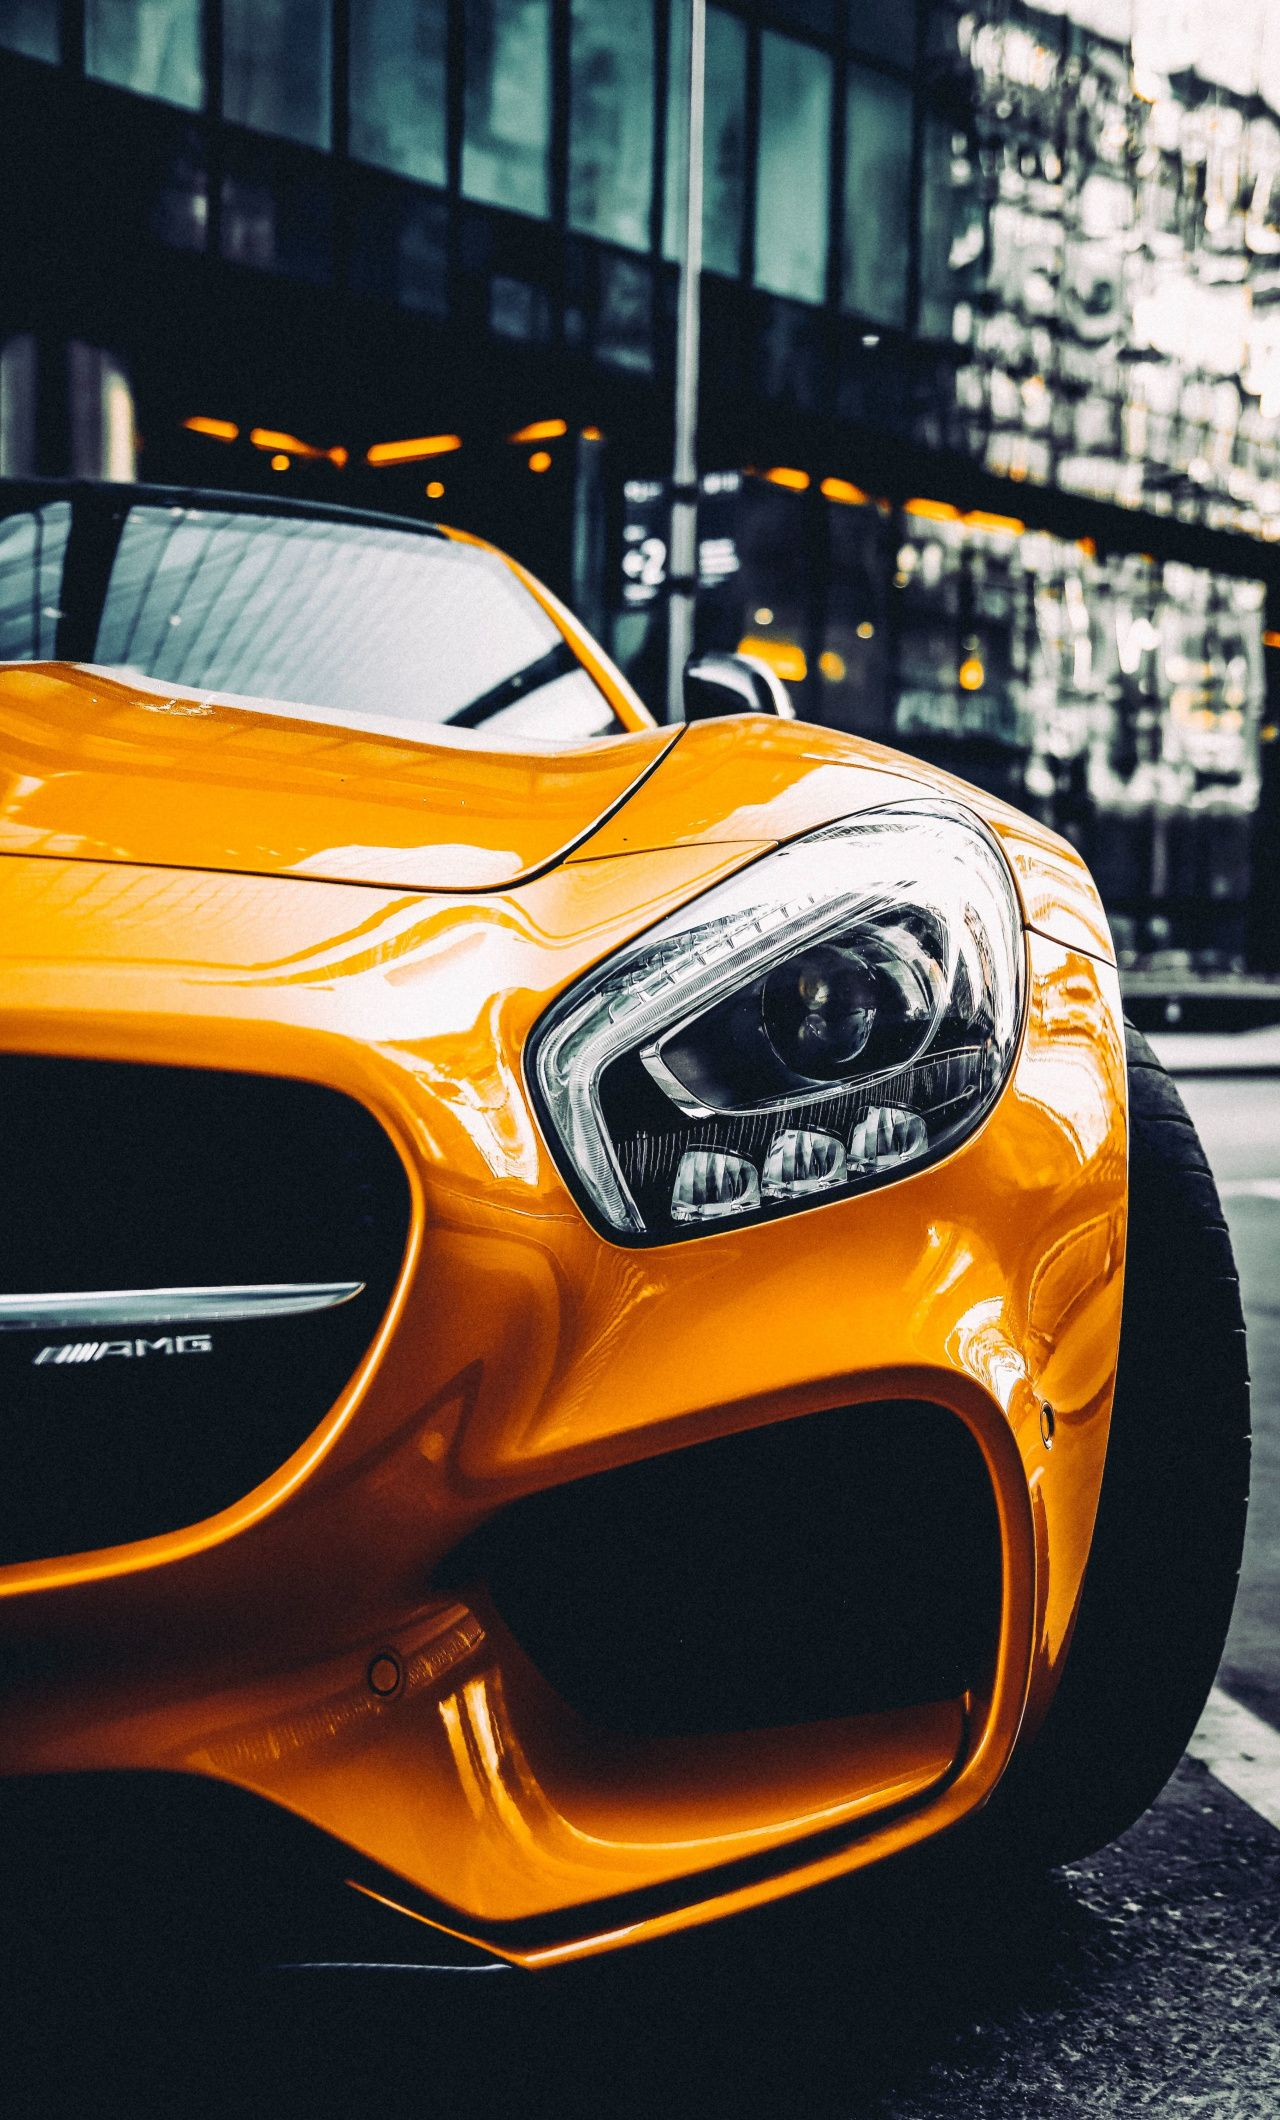 1280x2120 Yellow Car Mercedes Headlight Wallpaper Yellow Car Car Wallpapers Daimler Benz